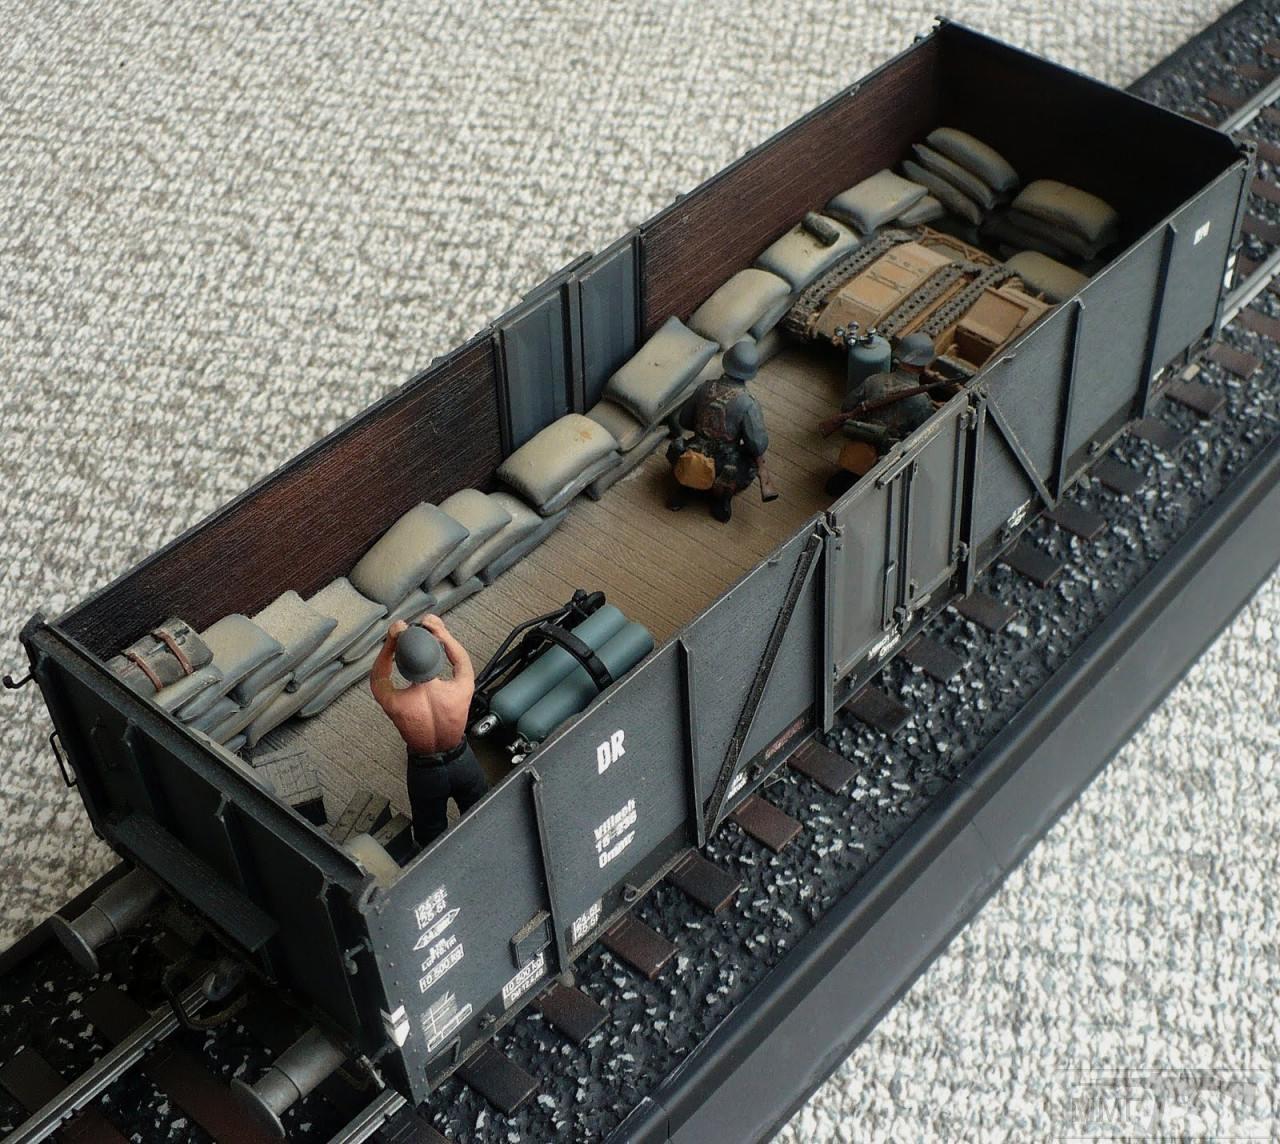 63893 - Обзор моделей и афтемаркета.